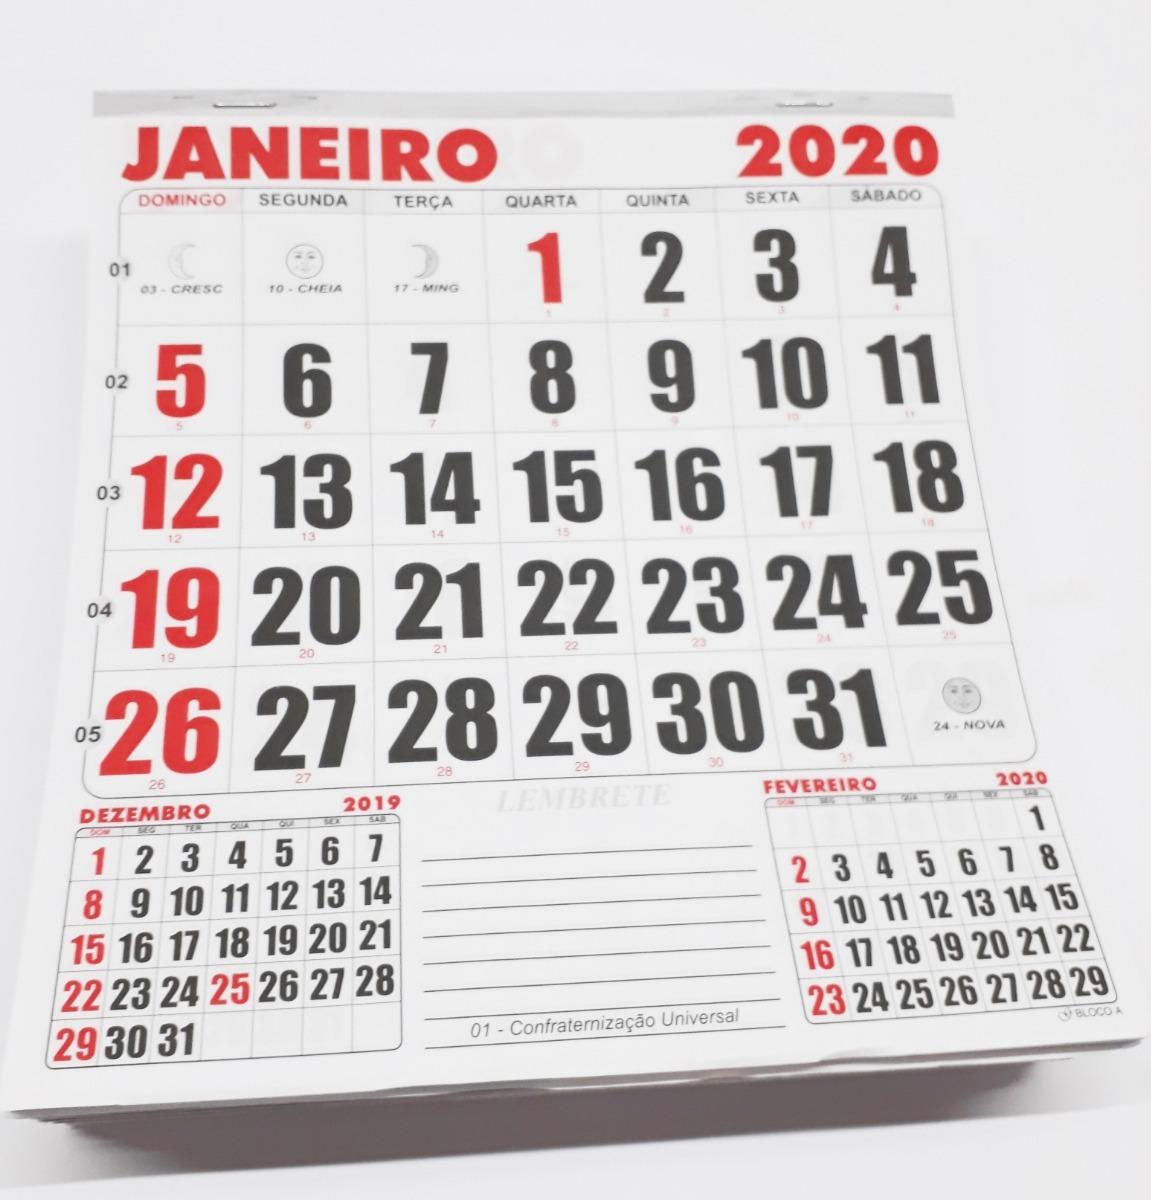 Calendario Dezembro 2019 Janeiro 2020.10 Calendarios Kit Bloco 21x22 Folhinha Parede Refil Anual